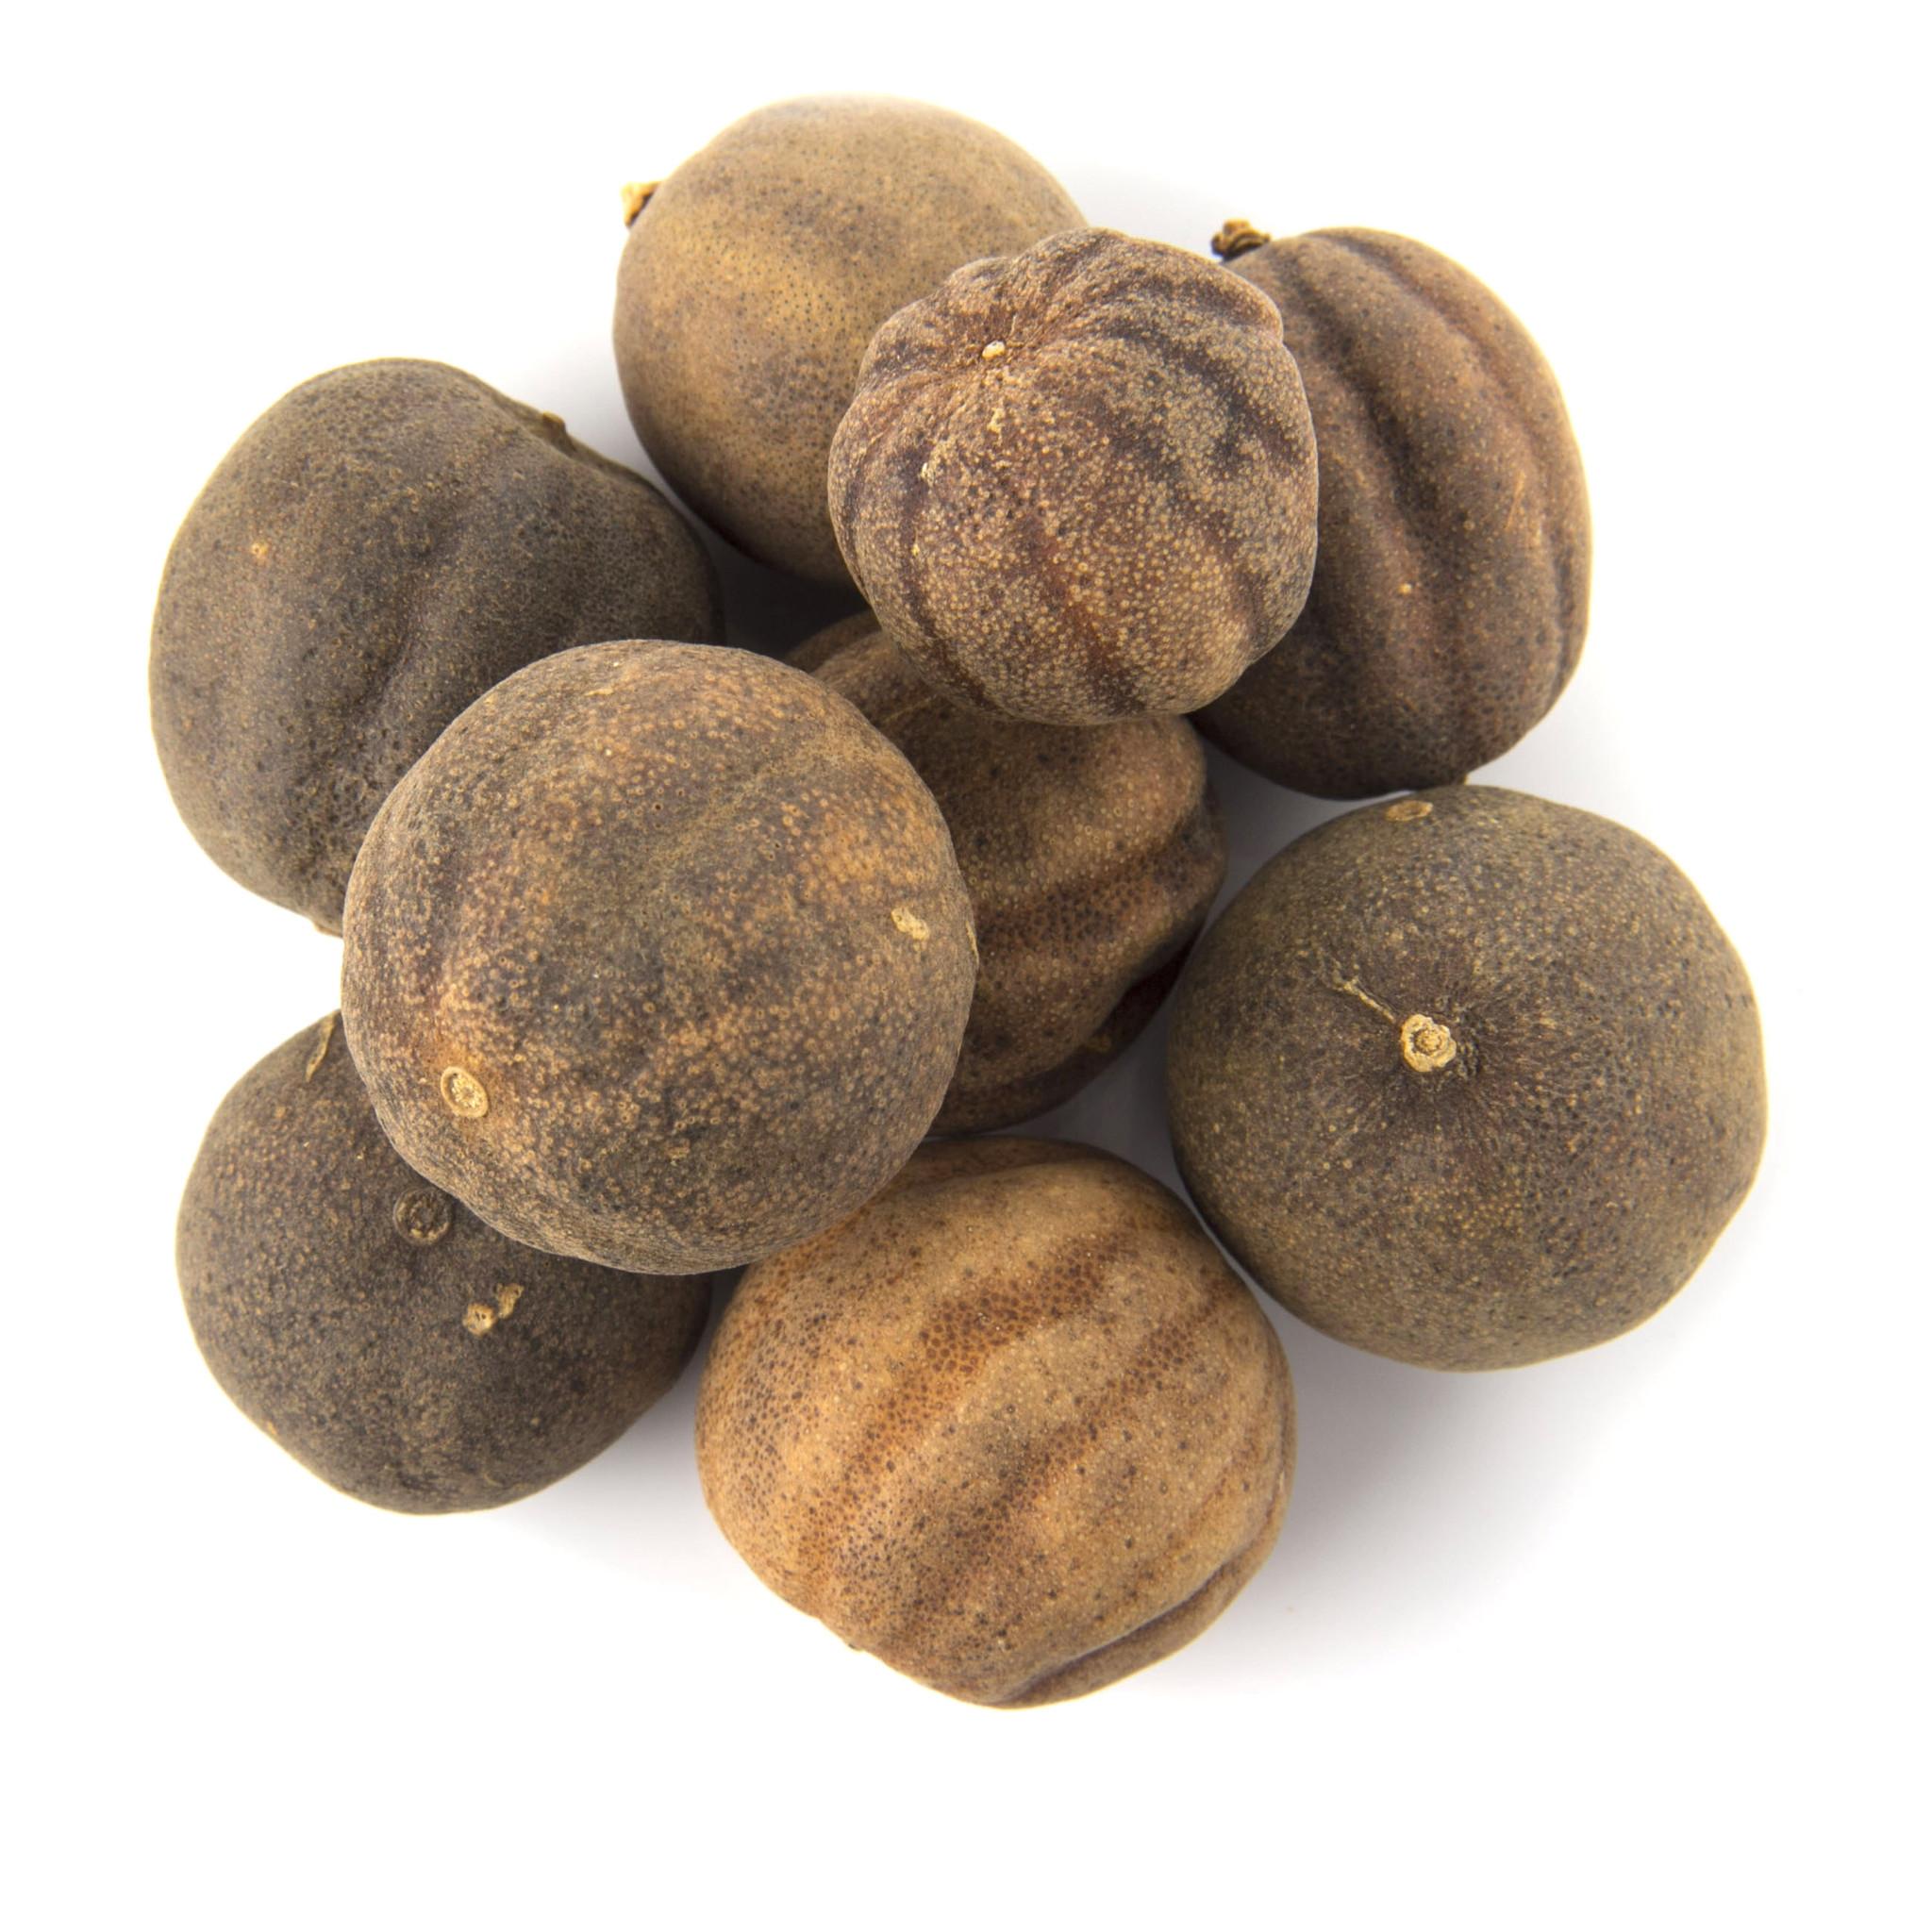 Dried Black Limes- Whole 100g (Loomi Basra)